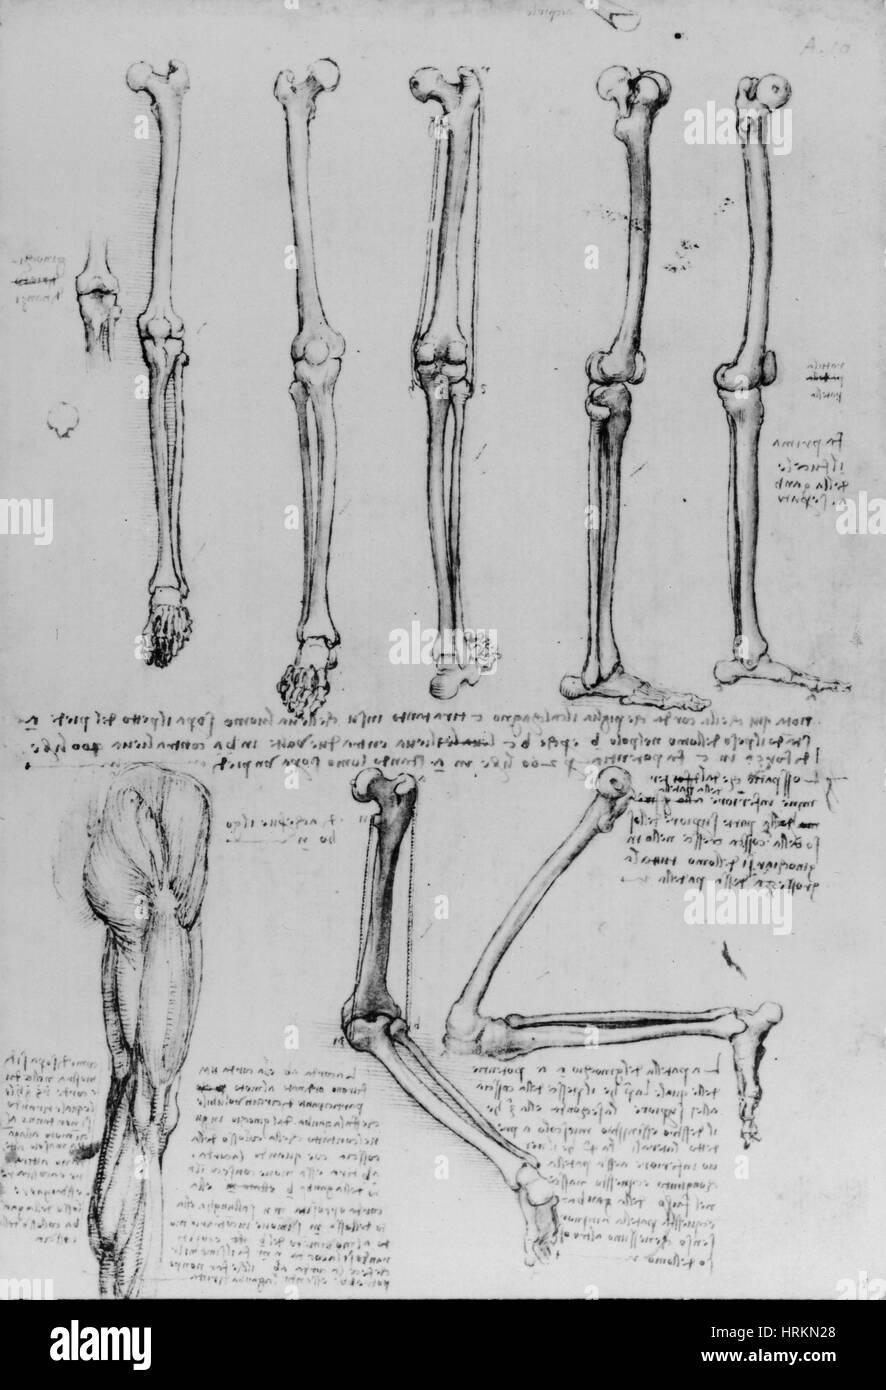 Da Vinci Anatomical Drawings Stock Photo: 135043280 - Alamy